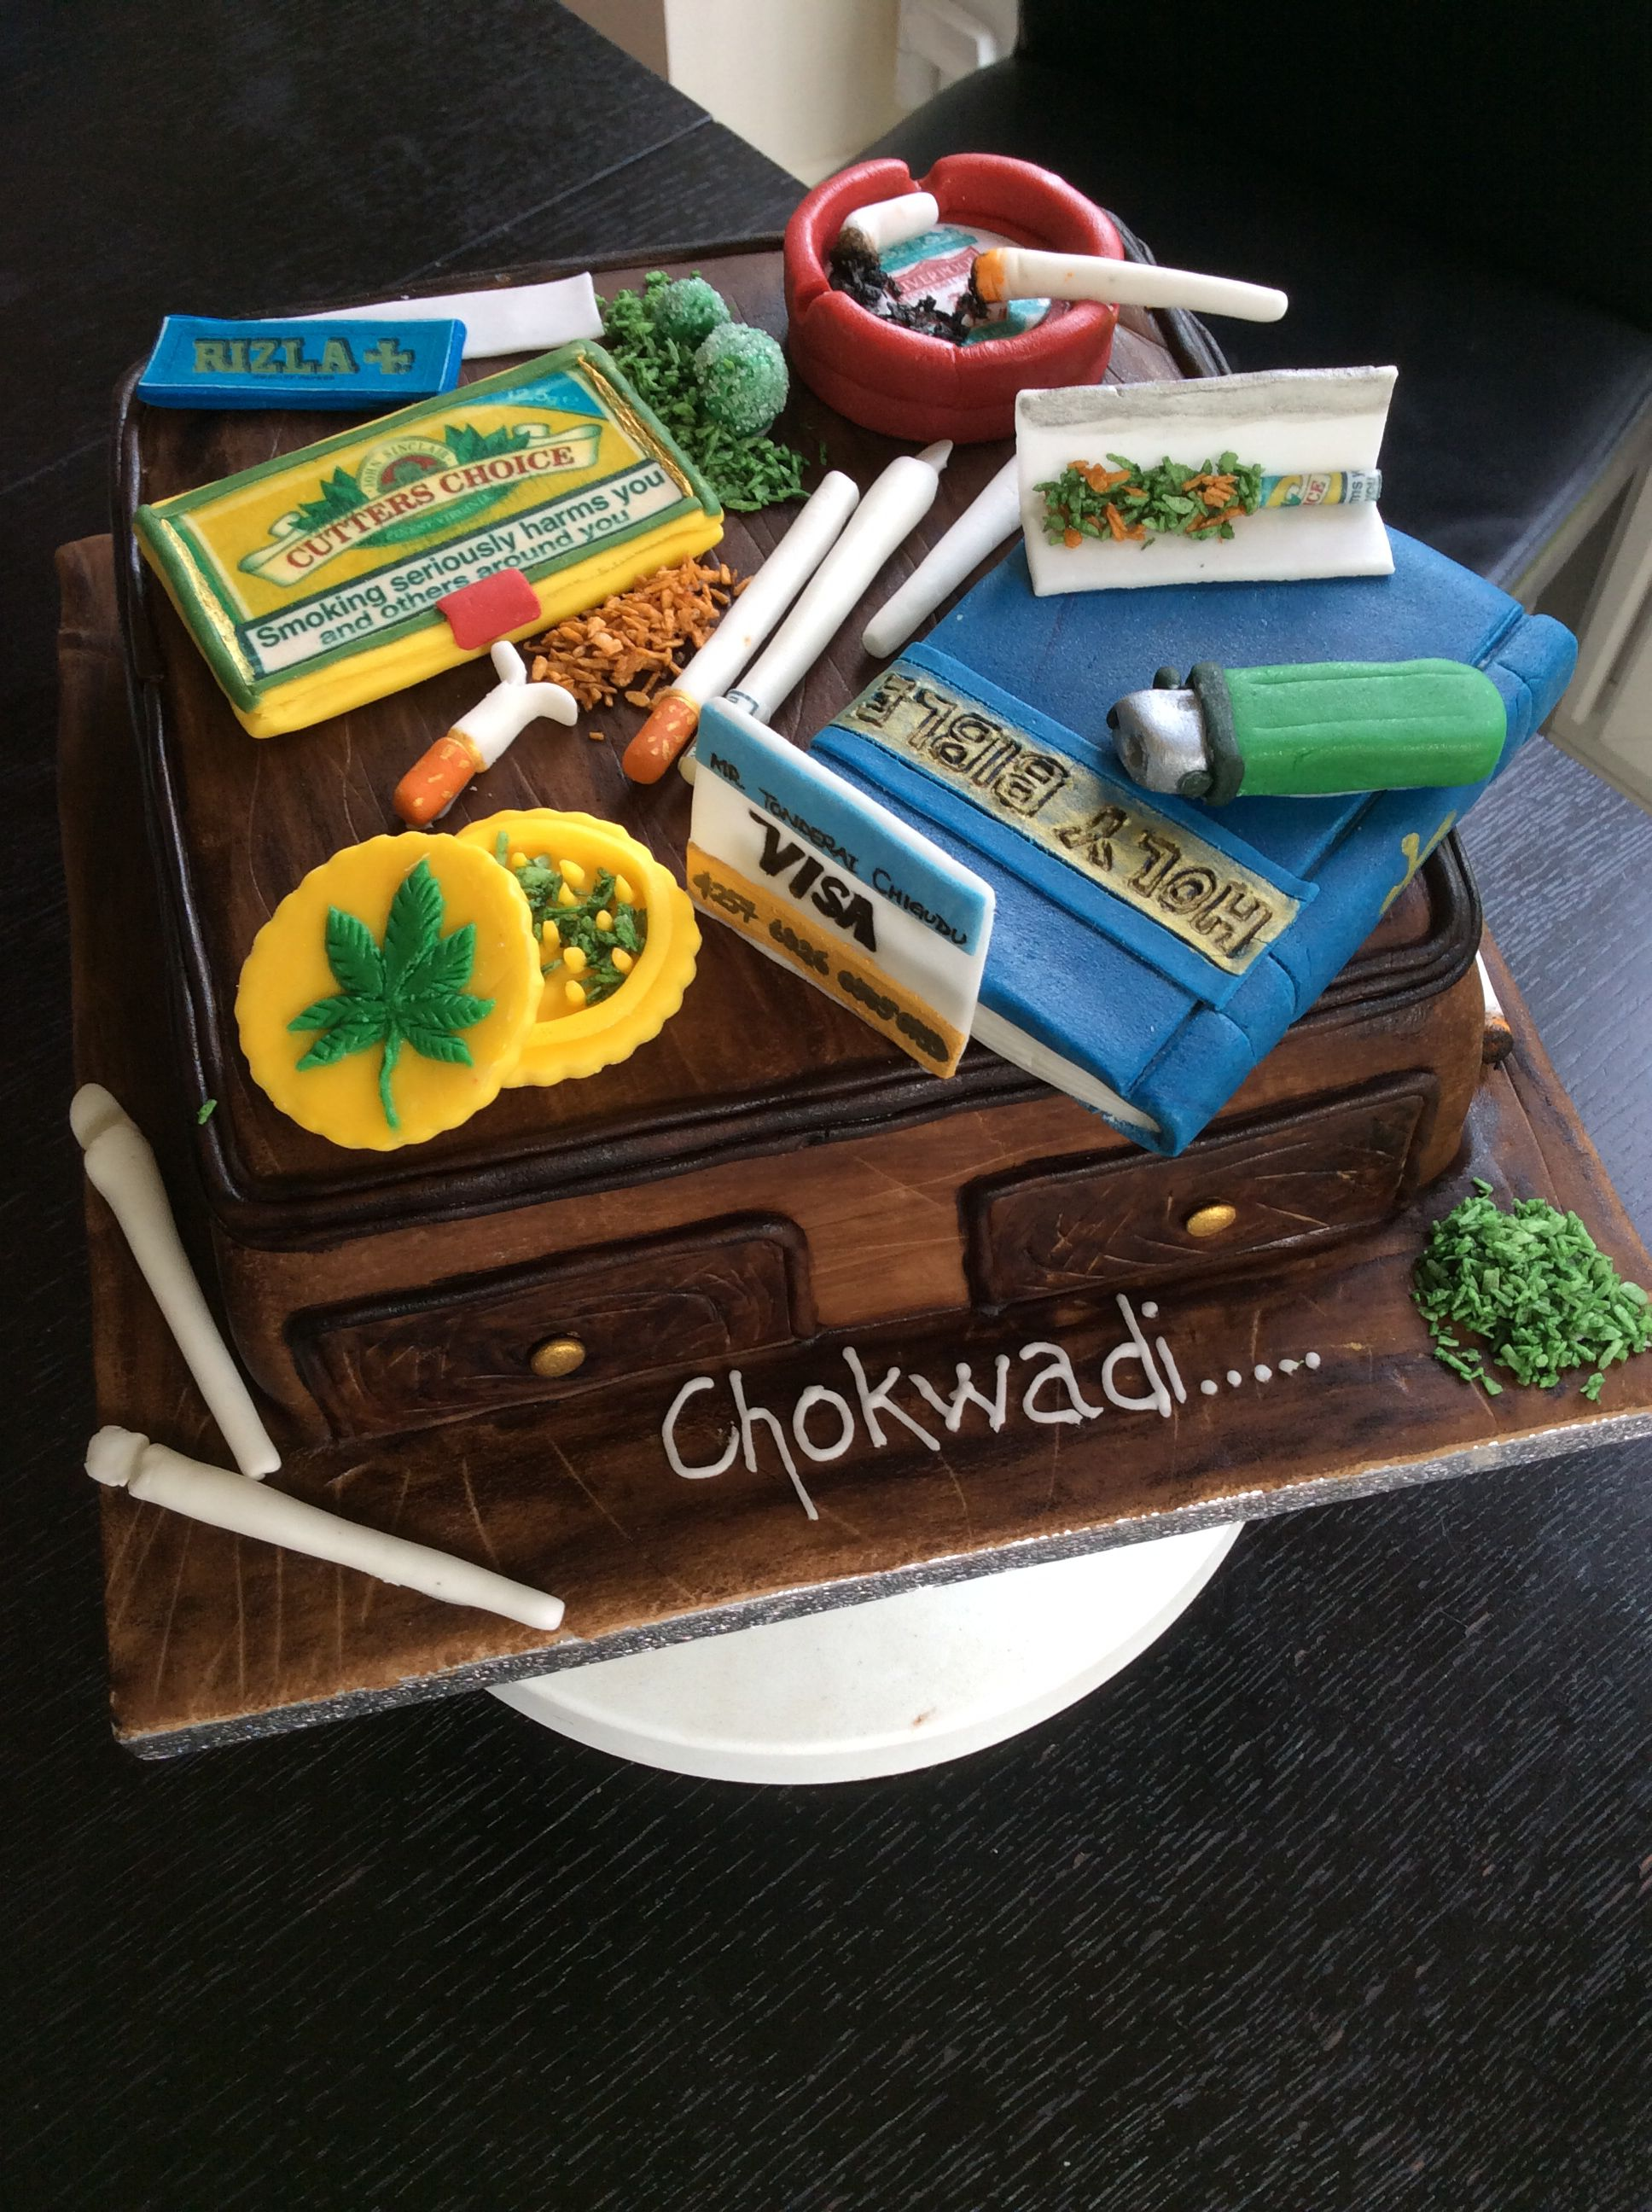 Sekuru s Stoner Cake Lime cake with coconut buttercream Had to